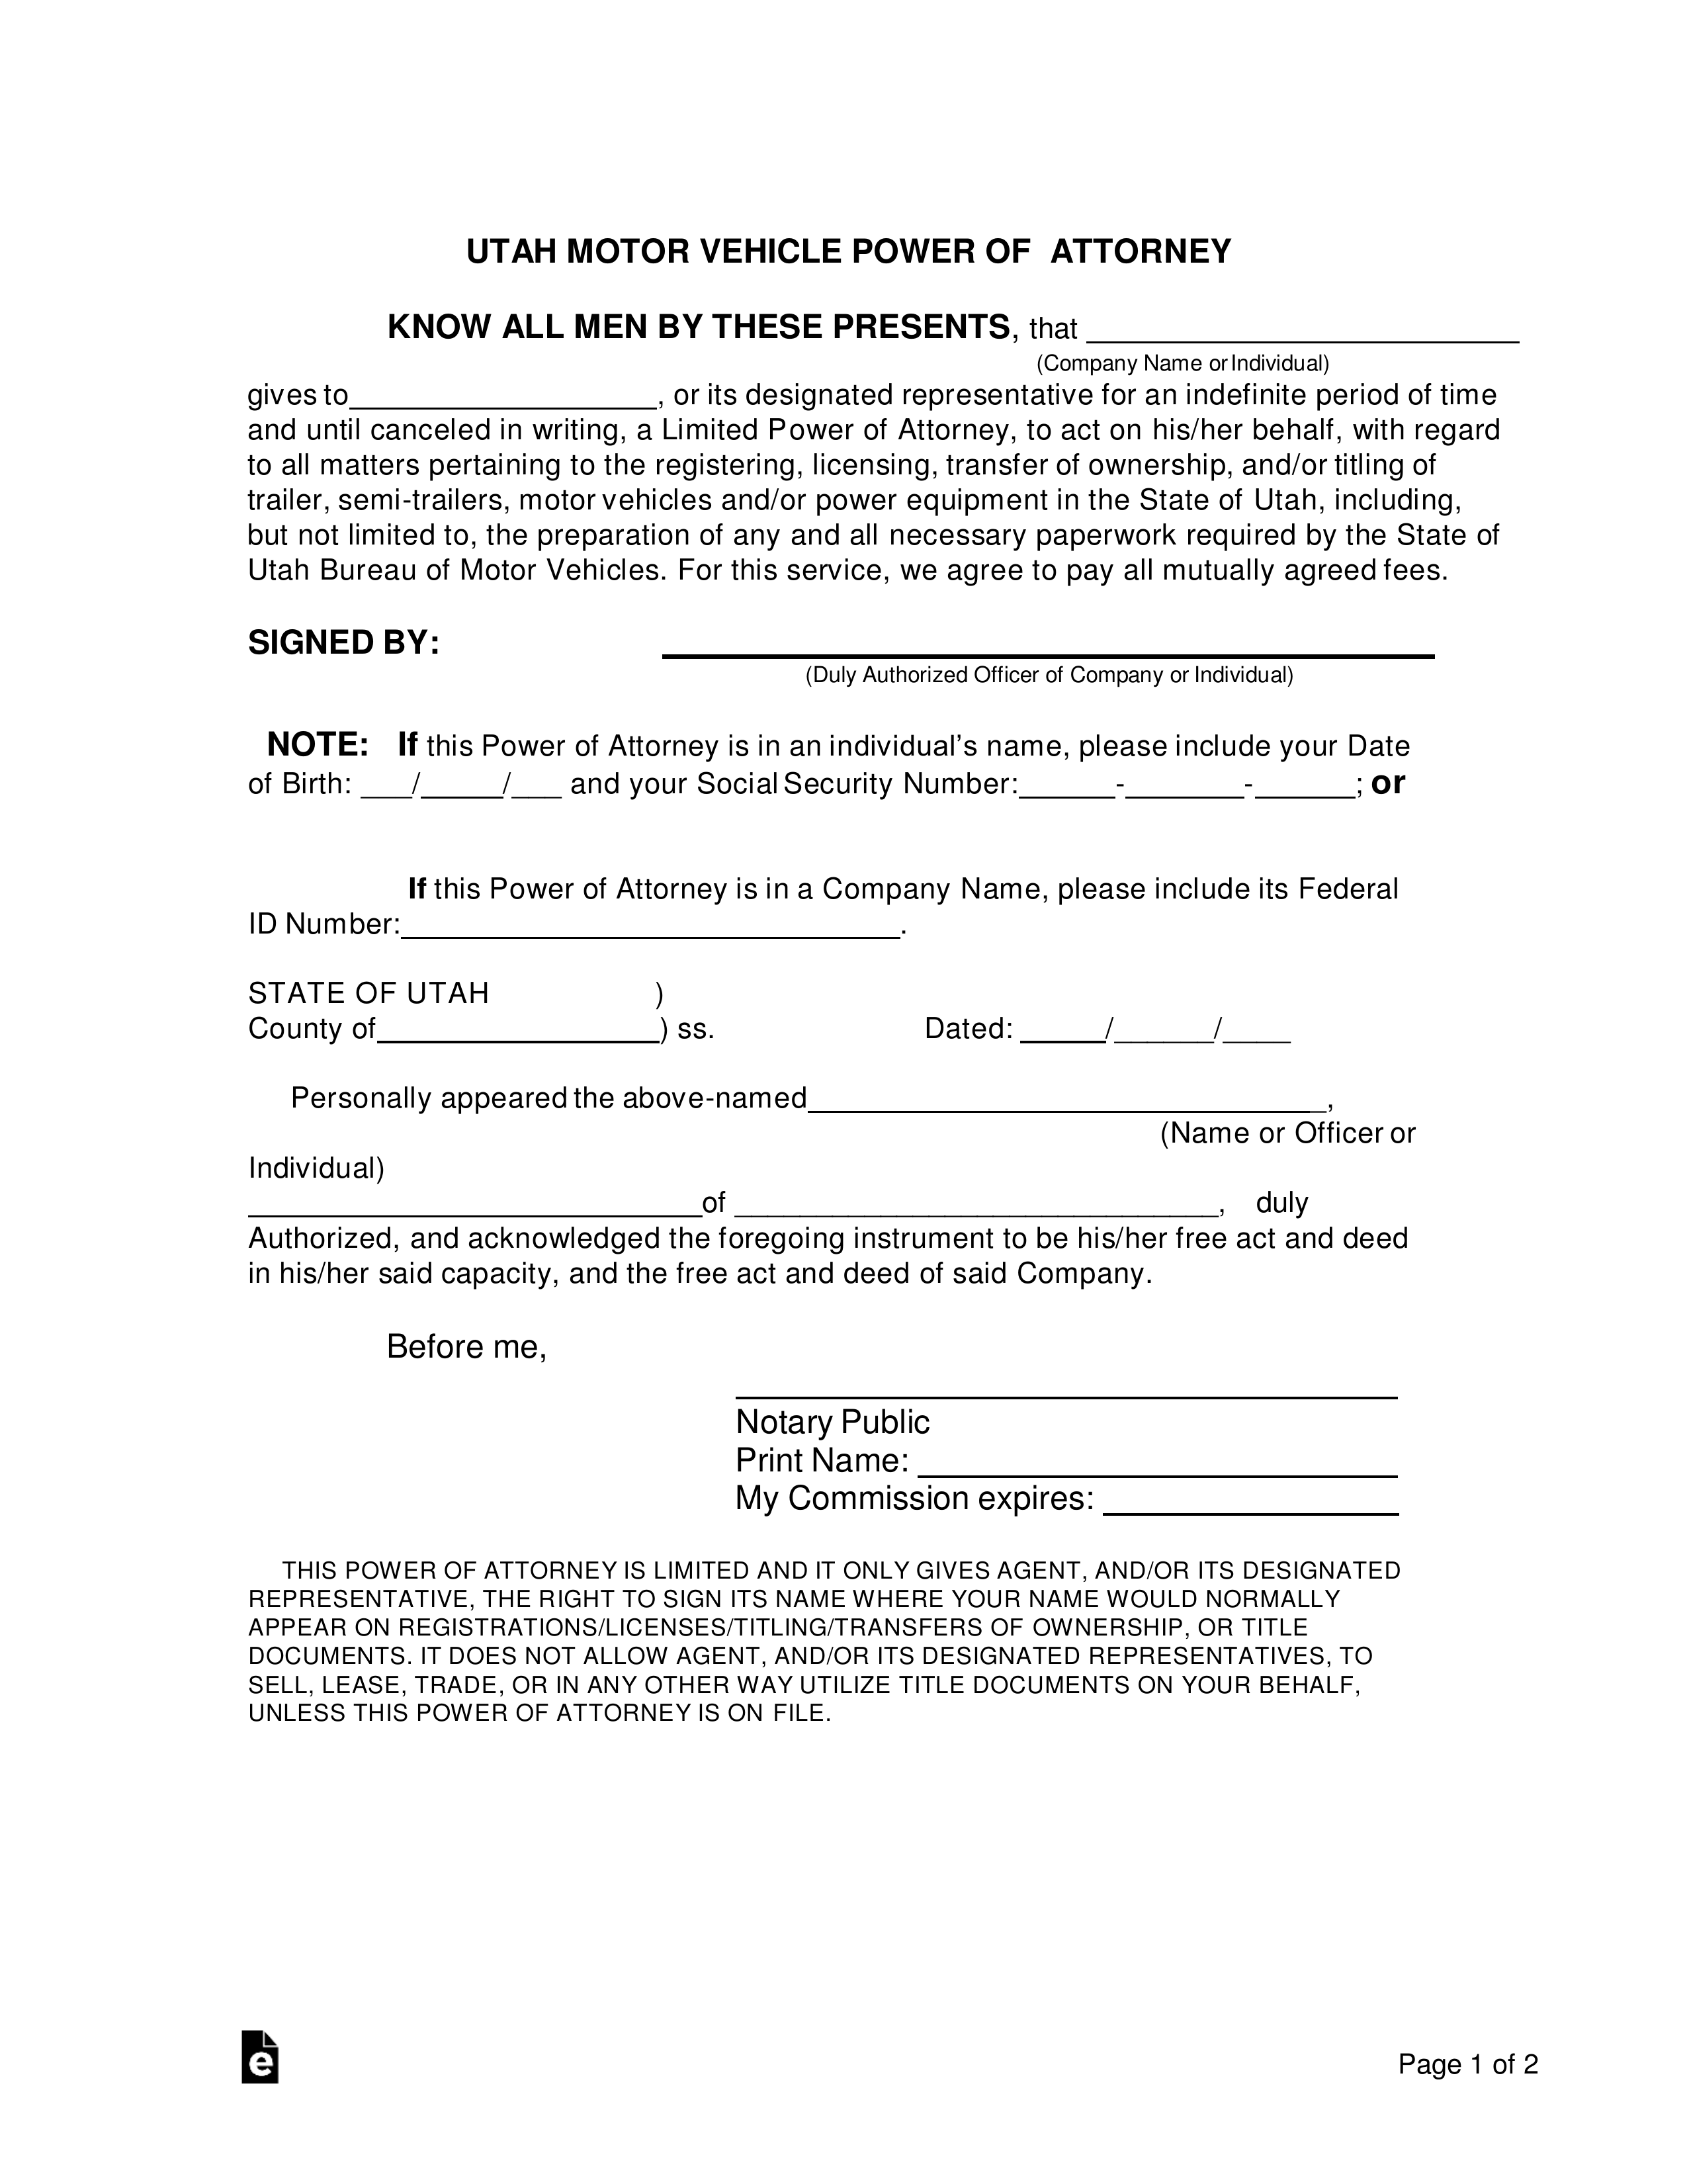 power of attorney form utah  Free Utah Motor Vehicle Power of Attorney Form - Word | PDF ...